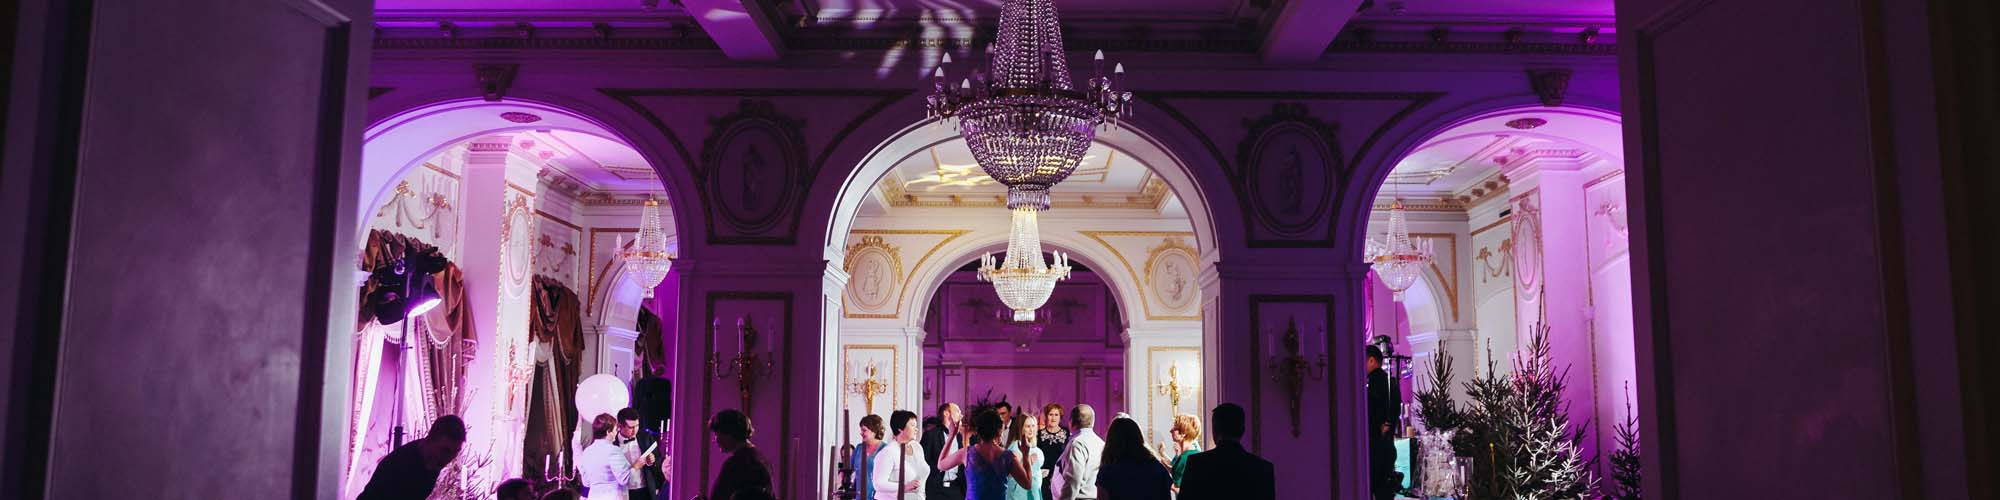 свадьба во дворце сюзора